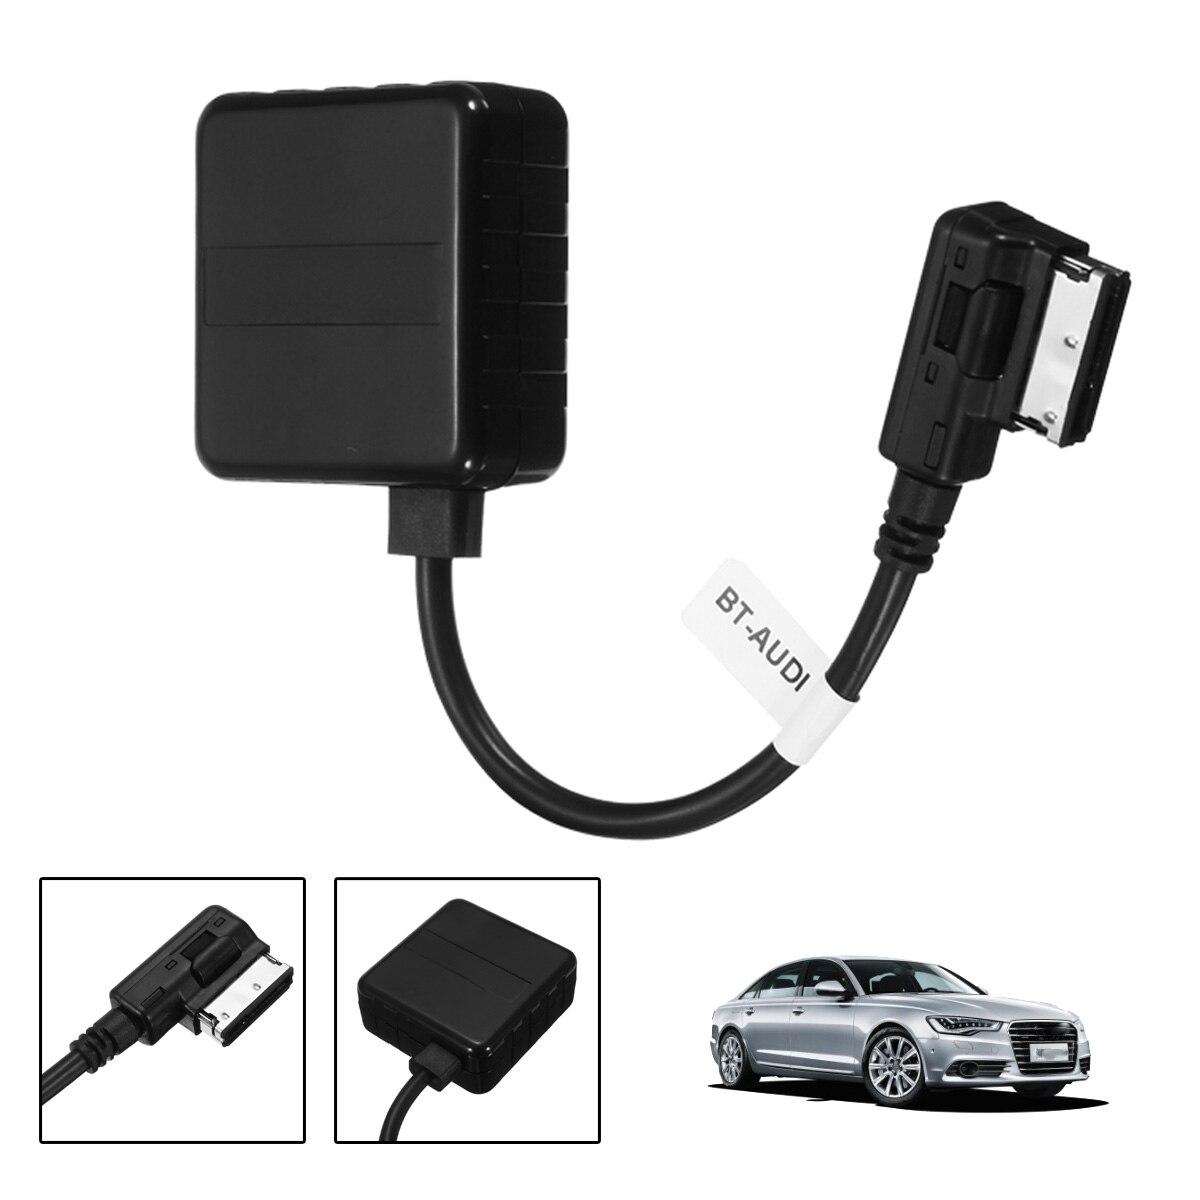 AMI MMI to Bluetooth 5.0 Hi-Fi Music Streaming in Car Media Interface Wireless Audio Receiver Audi A4 2014 HWINTEC Bluetooth Adapter for Audi A4